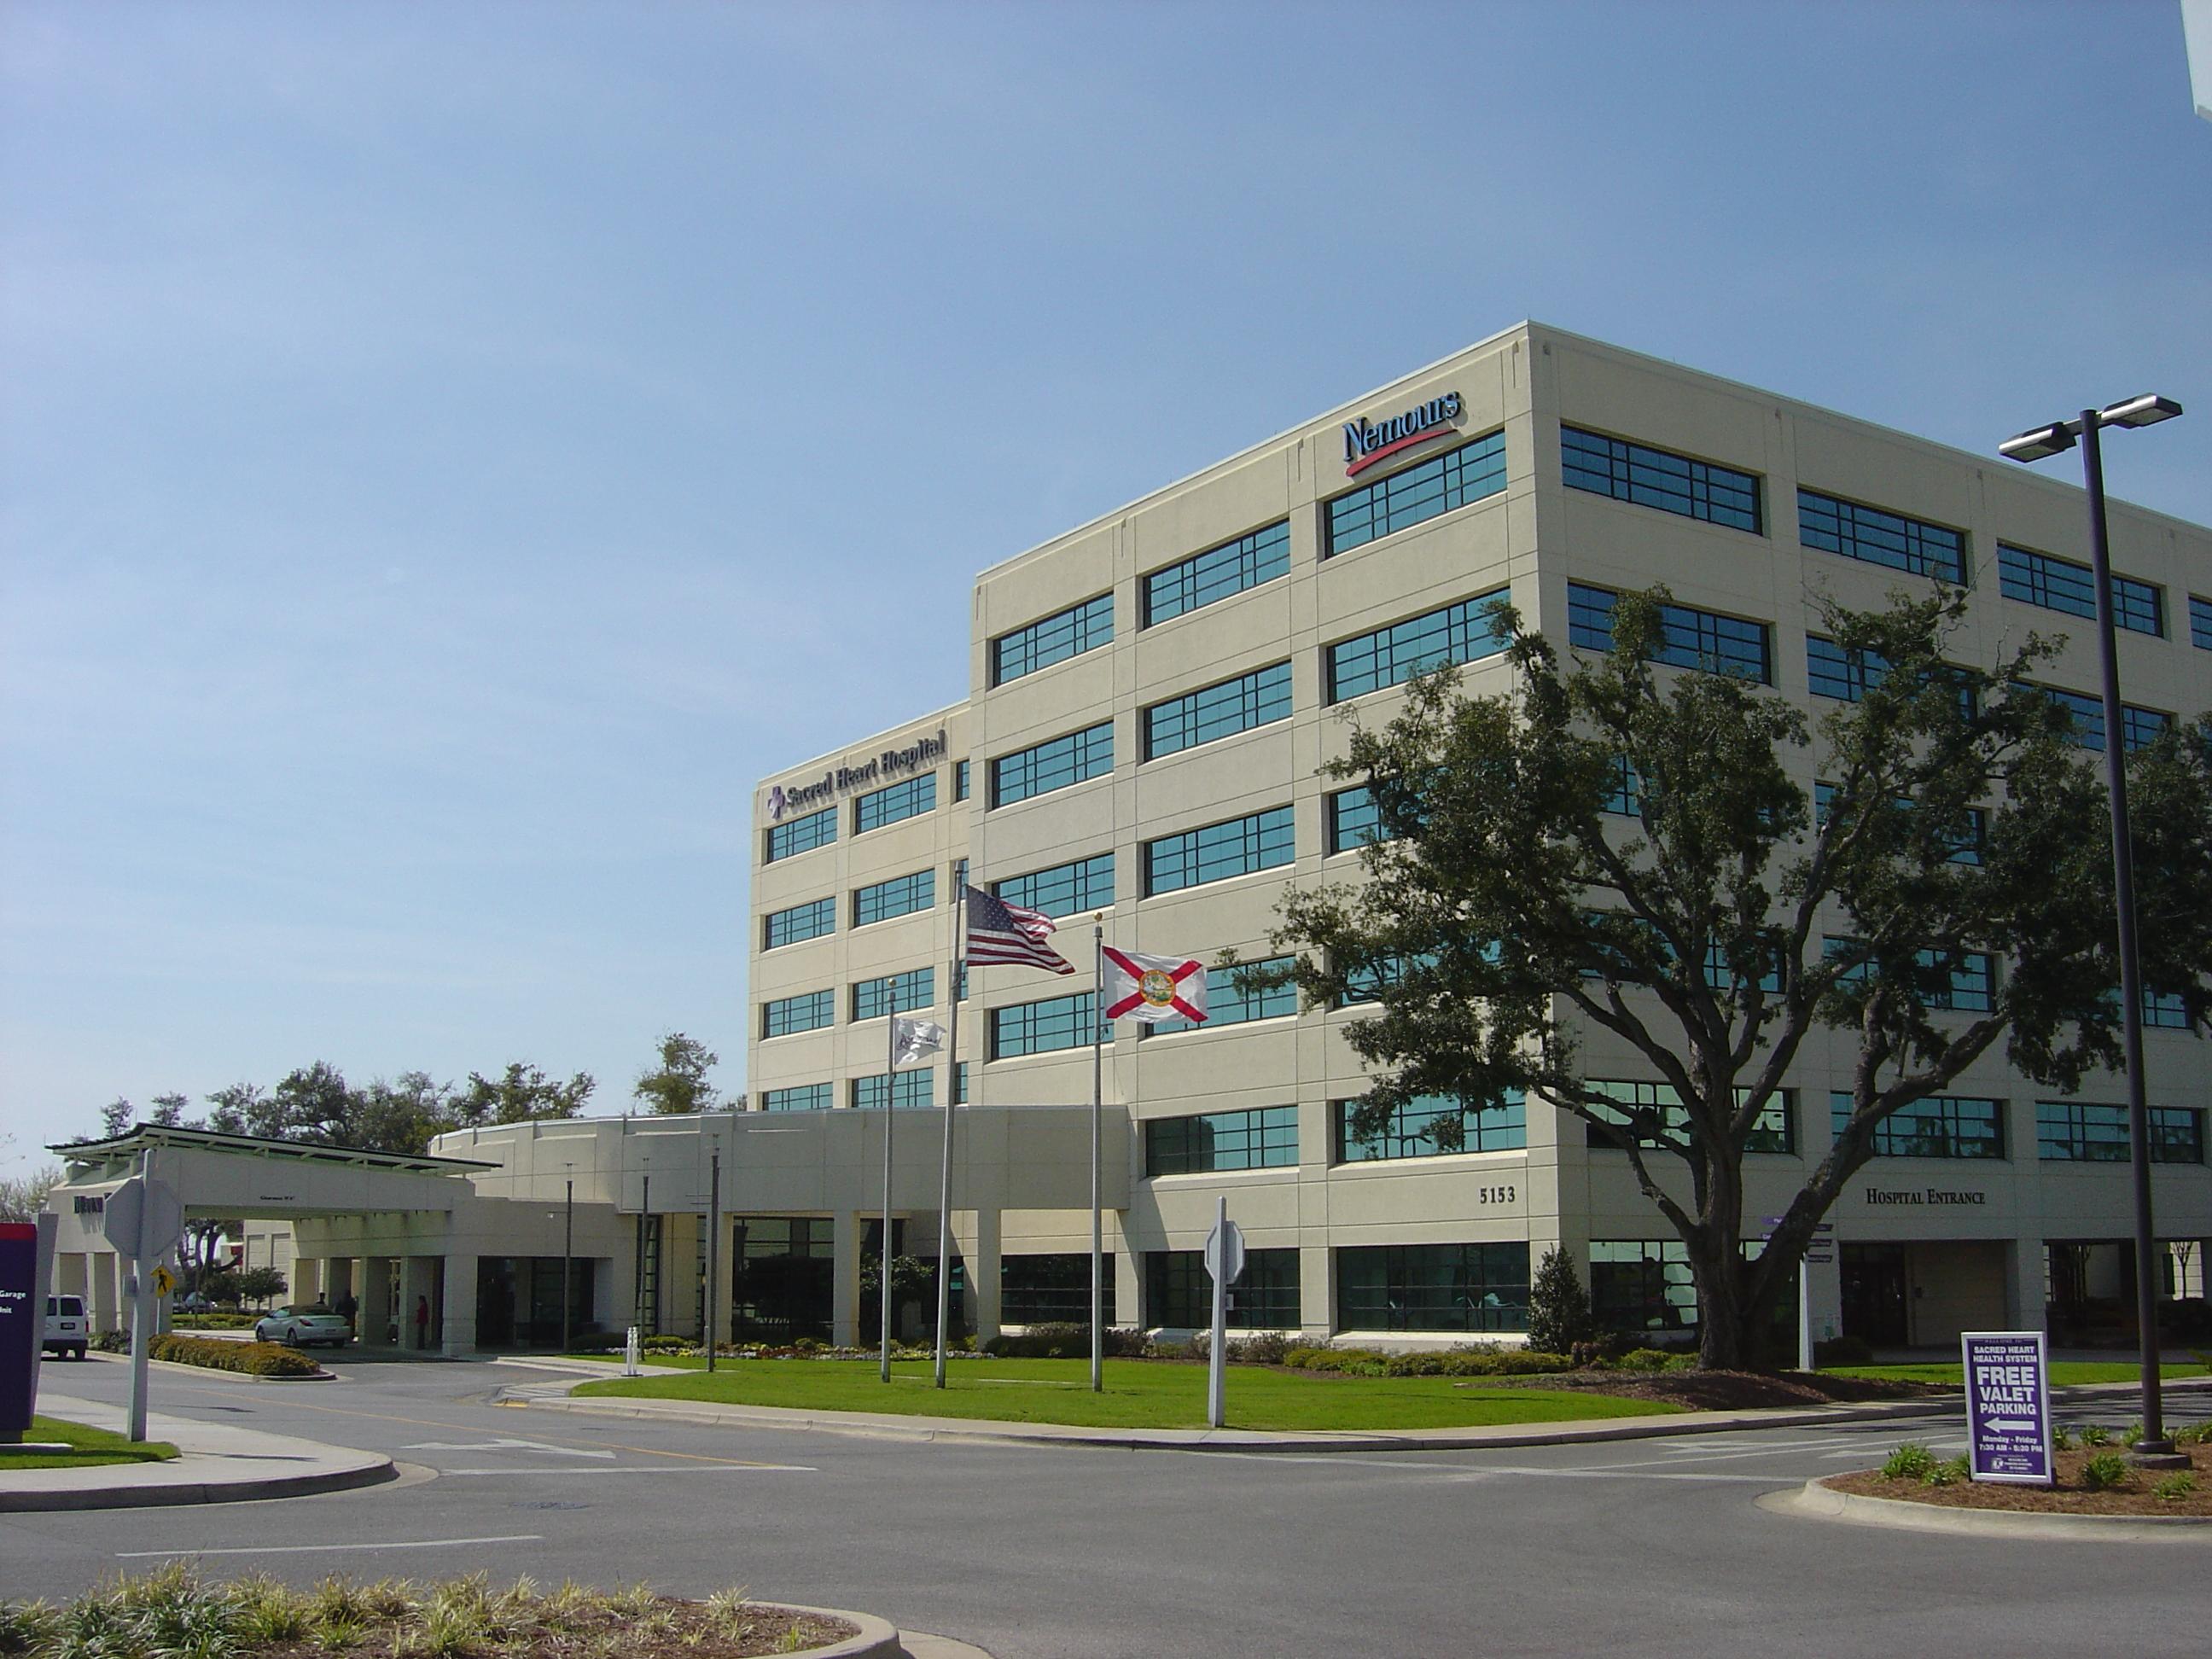 SACRED HEART HOSPITAL 5151 N 9th Ave, Pensacola, FL 32504